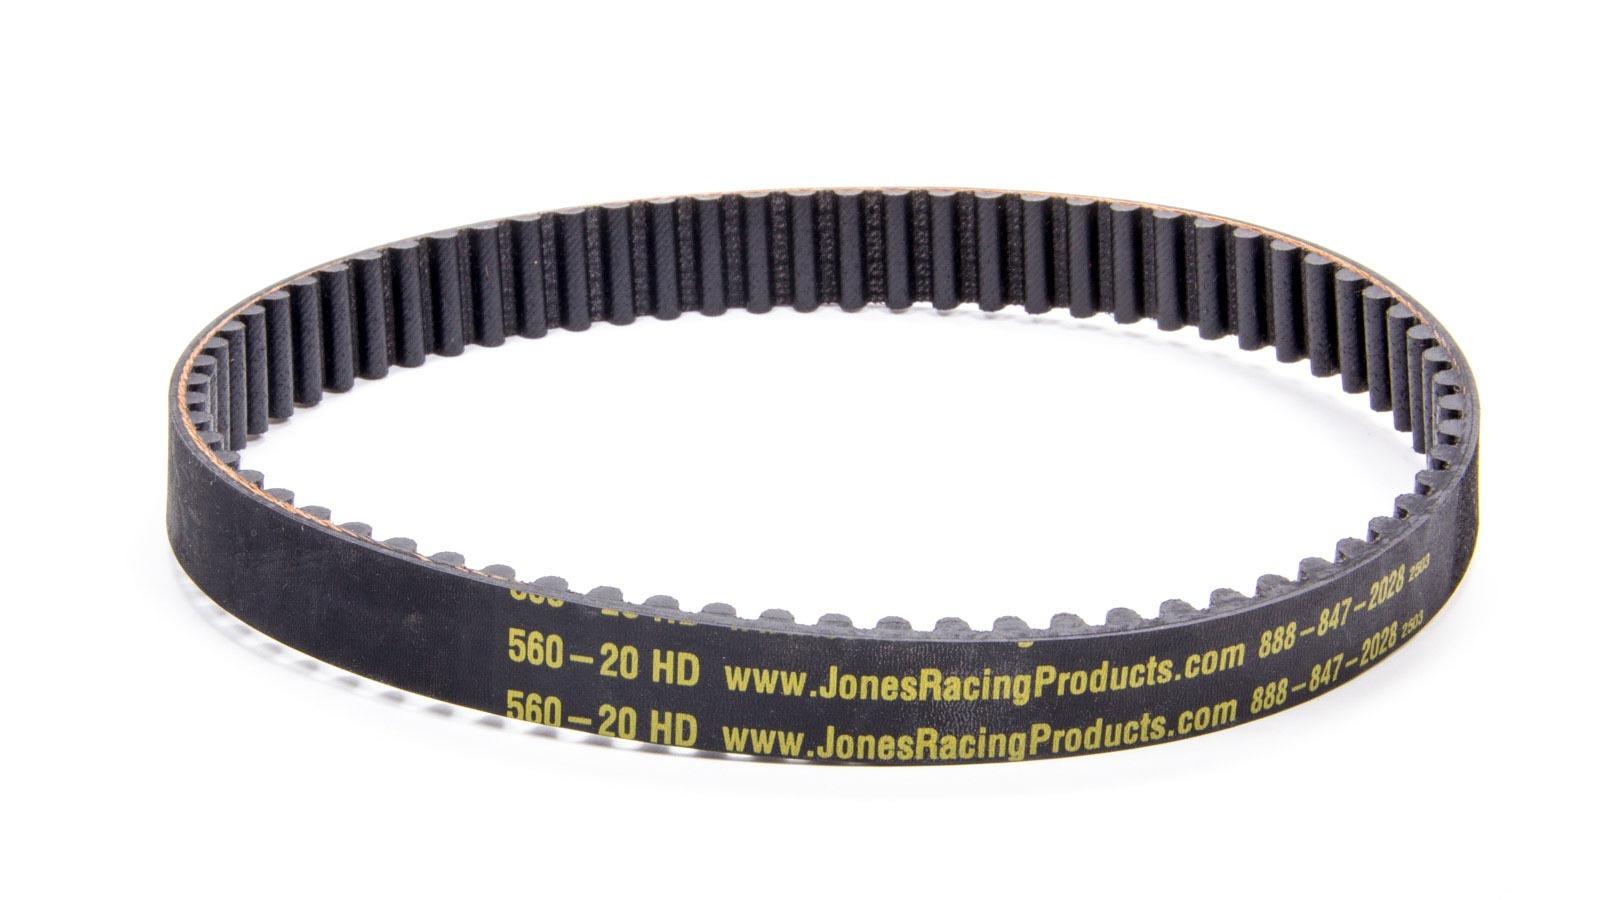 HTD Belt 34.646 Long 20mm Wide